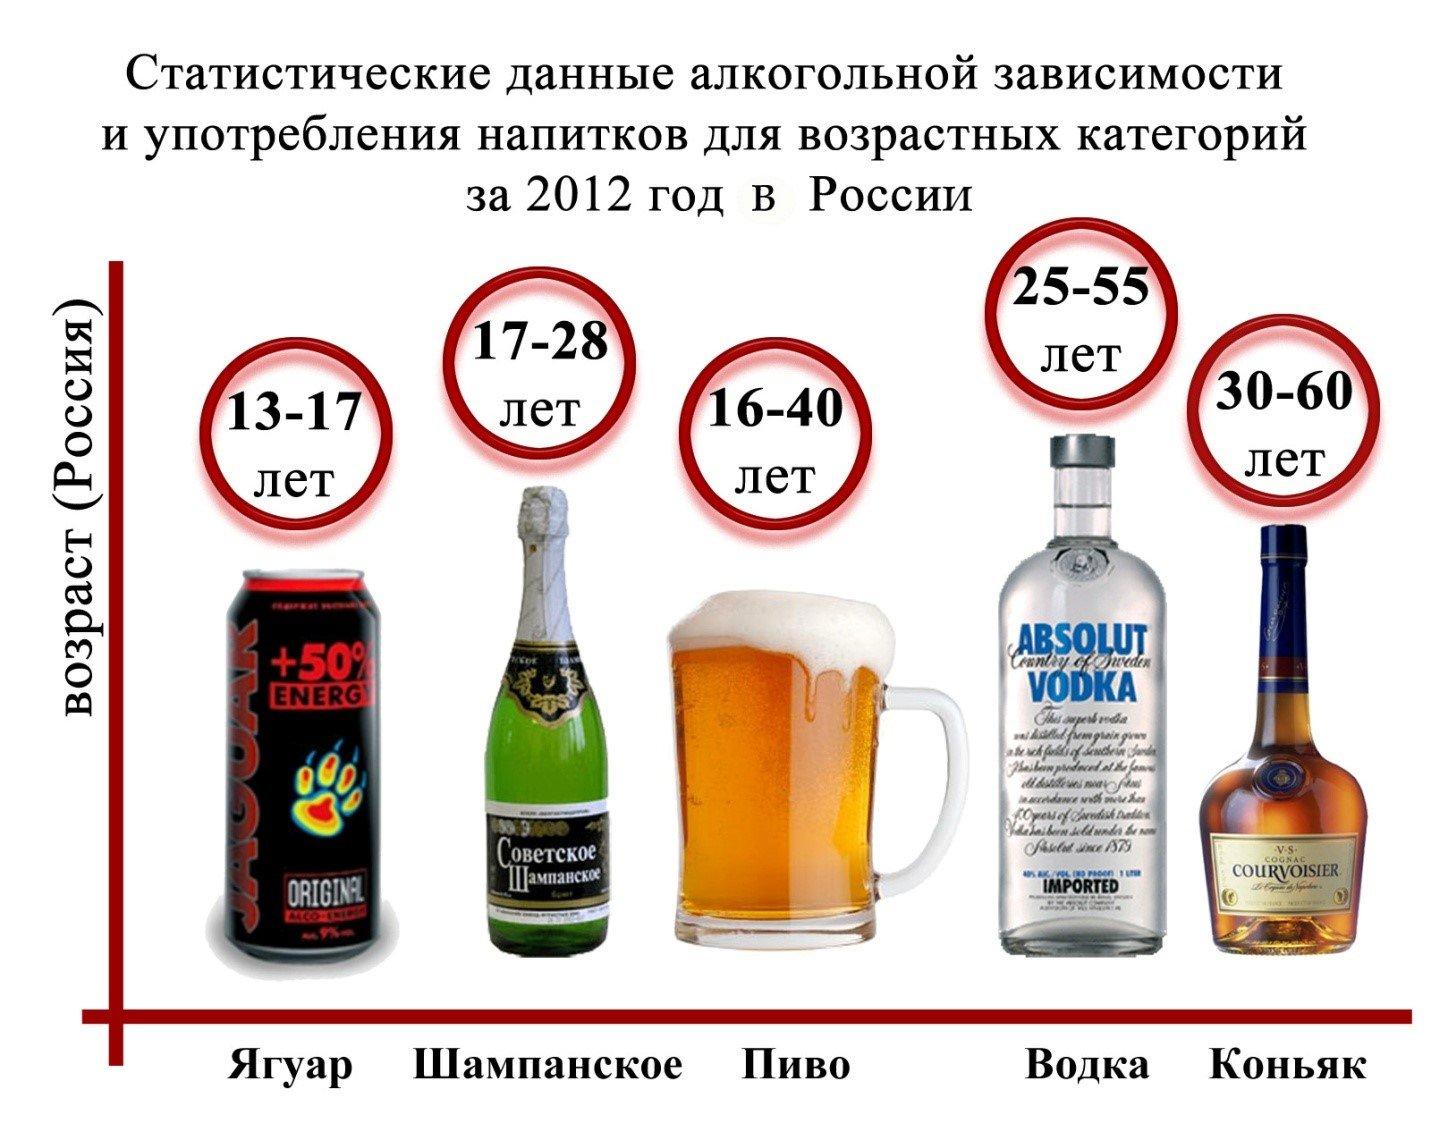 alkogolnaia zavisimost - Карма алкоголика